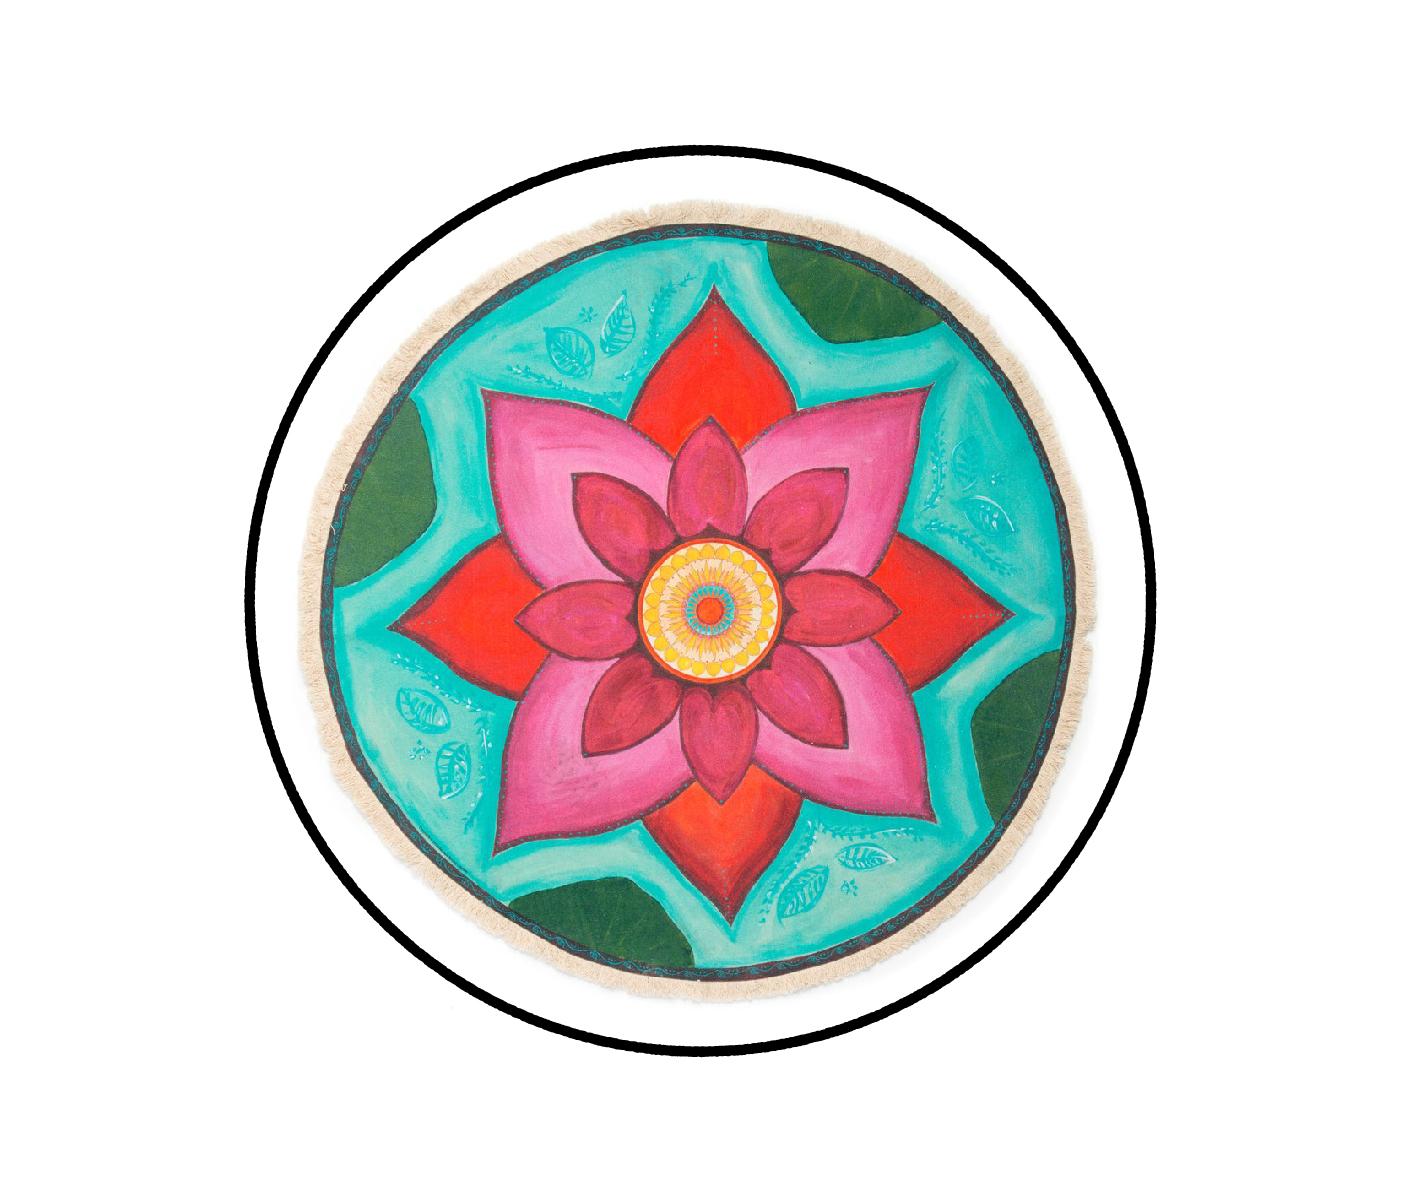 """New Beginnings"" - Pink Lotus Textile Meditation Mat by Mandala Blooms"